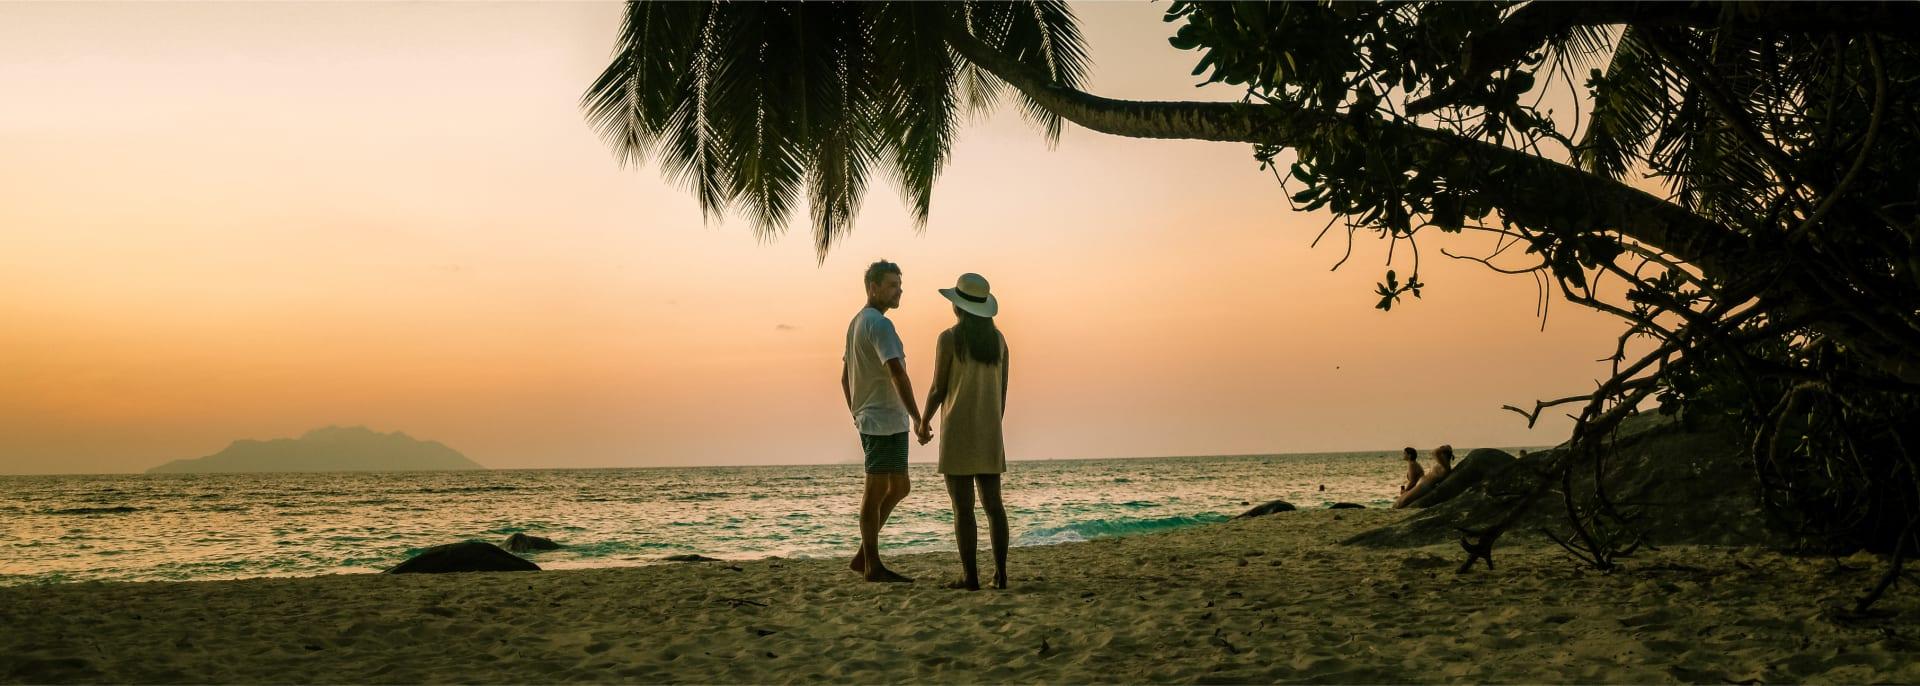 Romantische Flitterwochen bei Sonnenuntergang, Seychellen